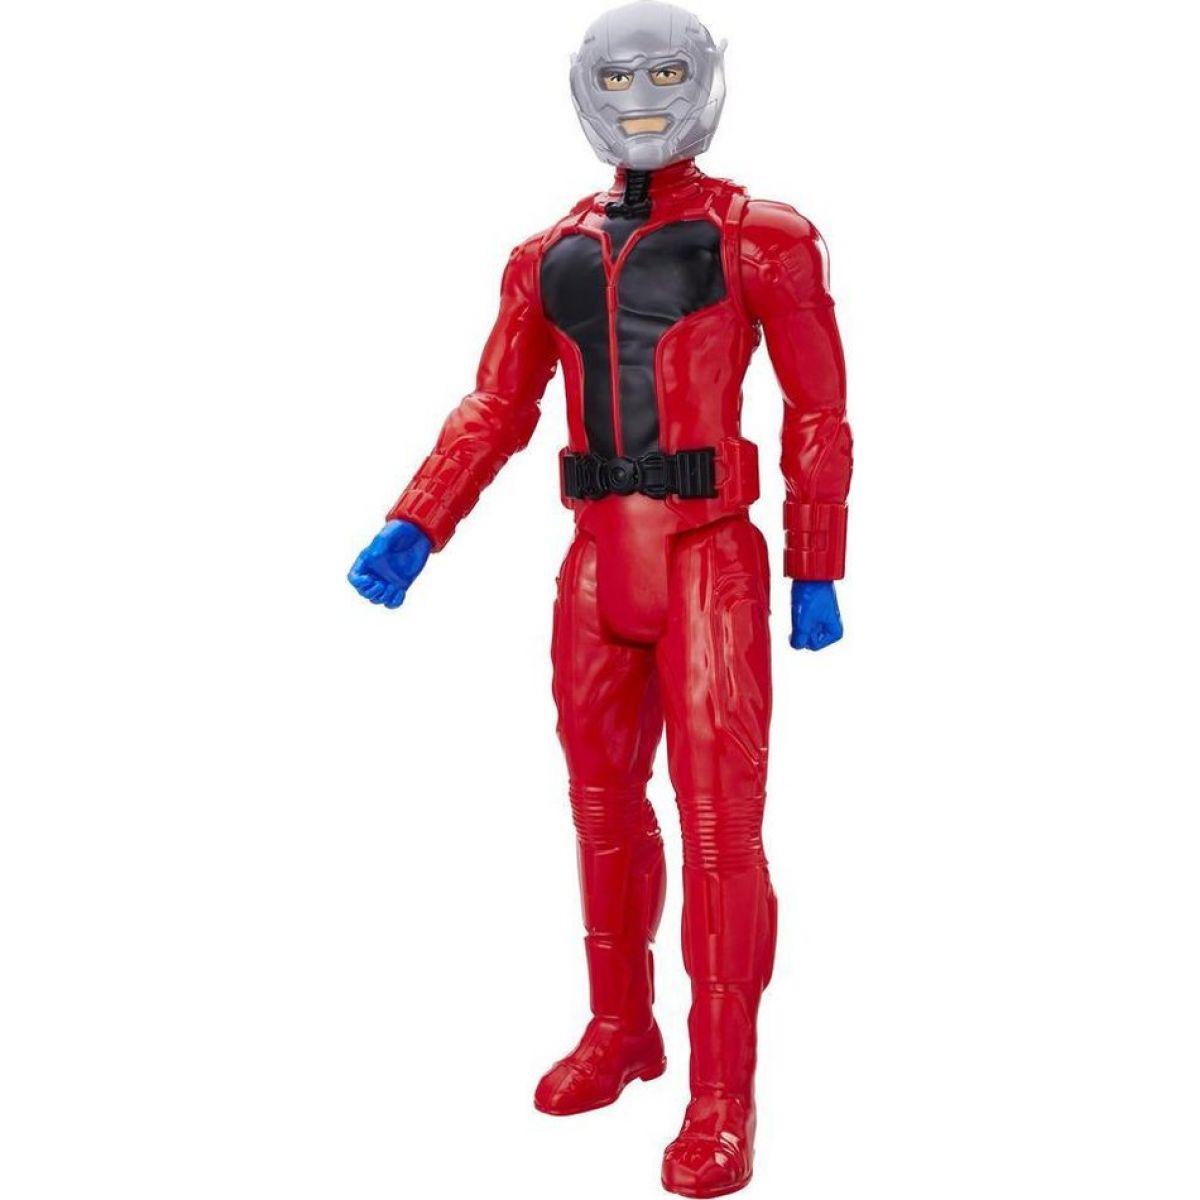 Hasbro Avengers 30 cm titán Ant Man